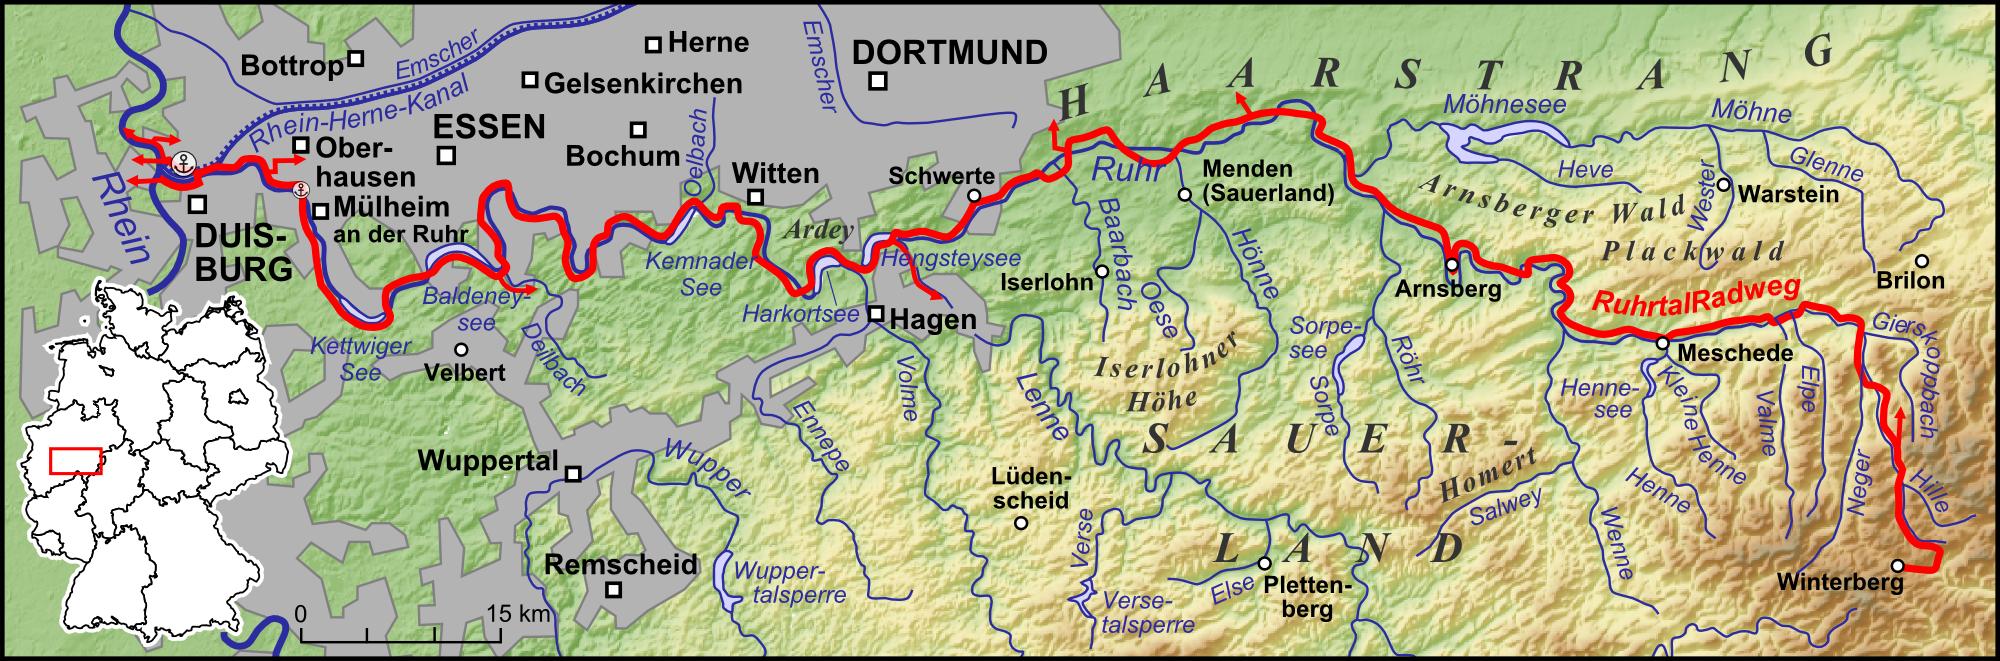 ruhrtalradweg karte